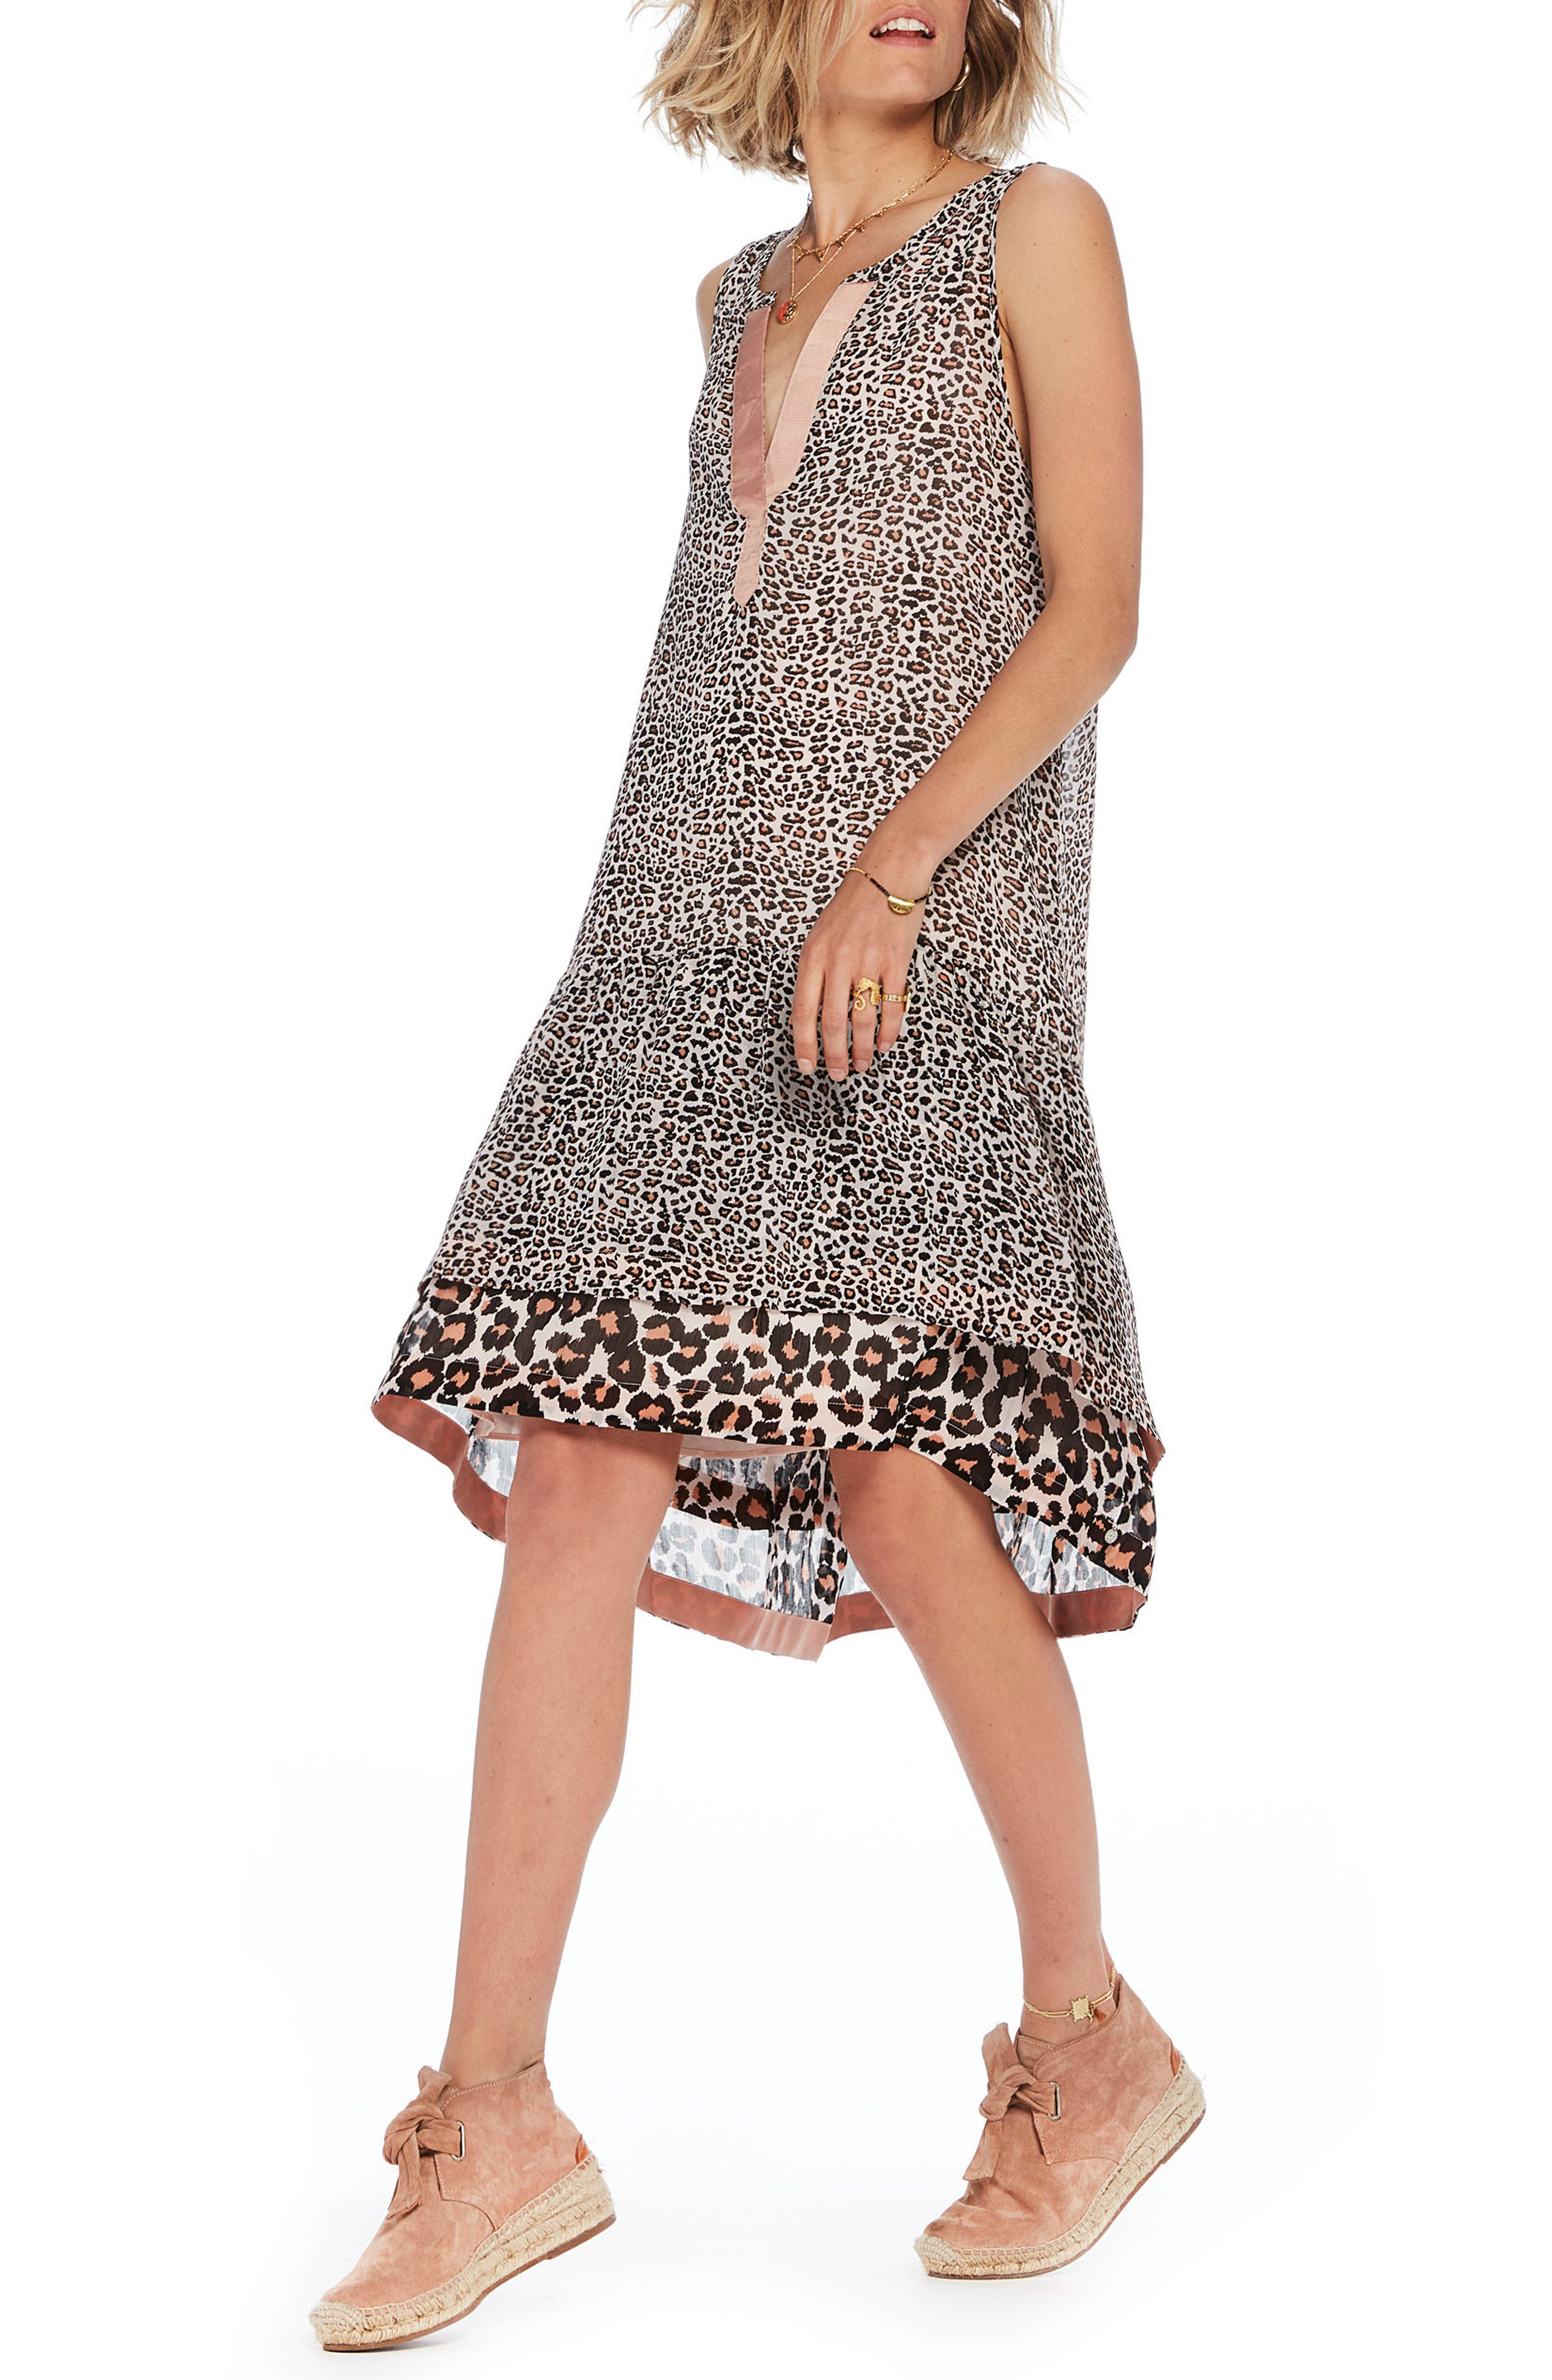 Scotch & Soda Animal Print Shift Dress